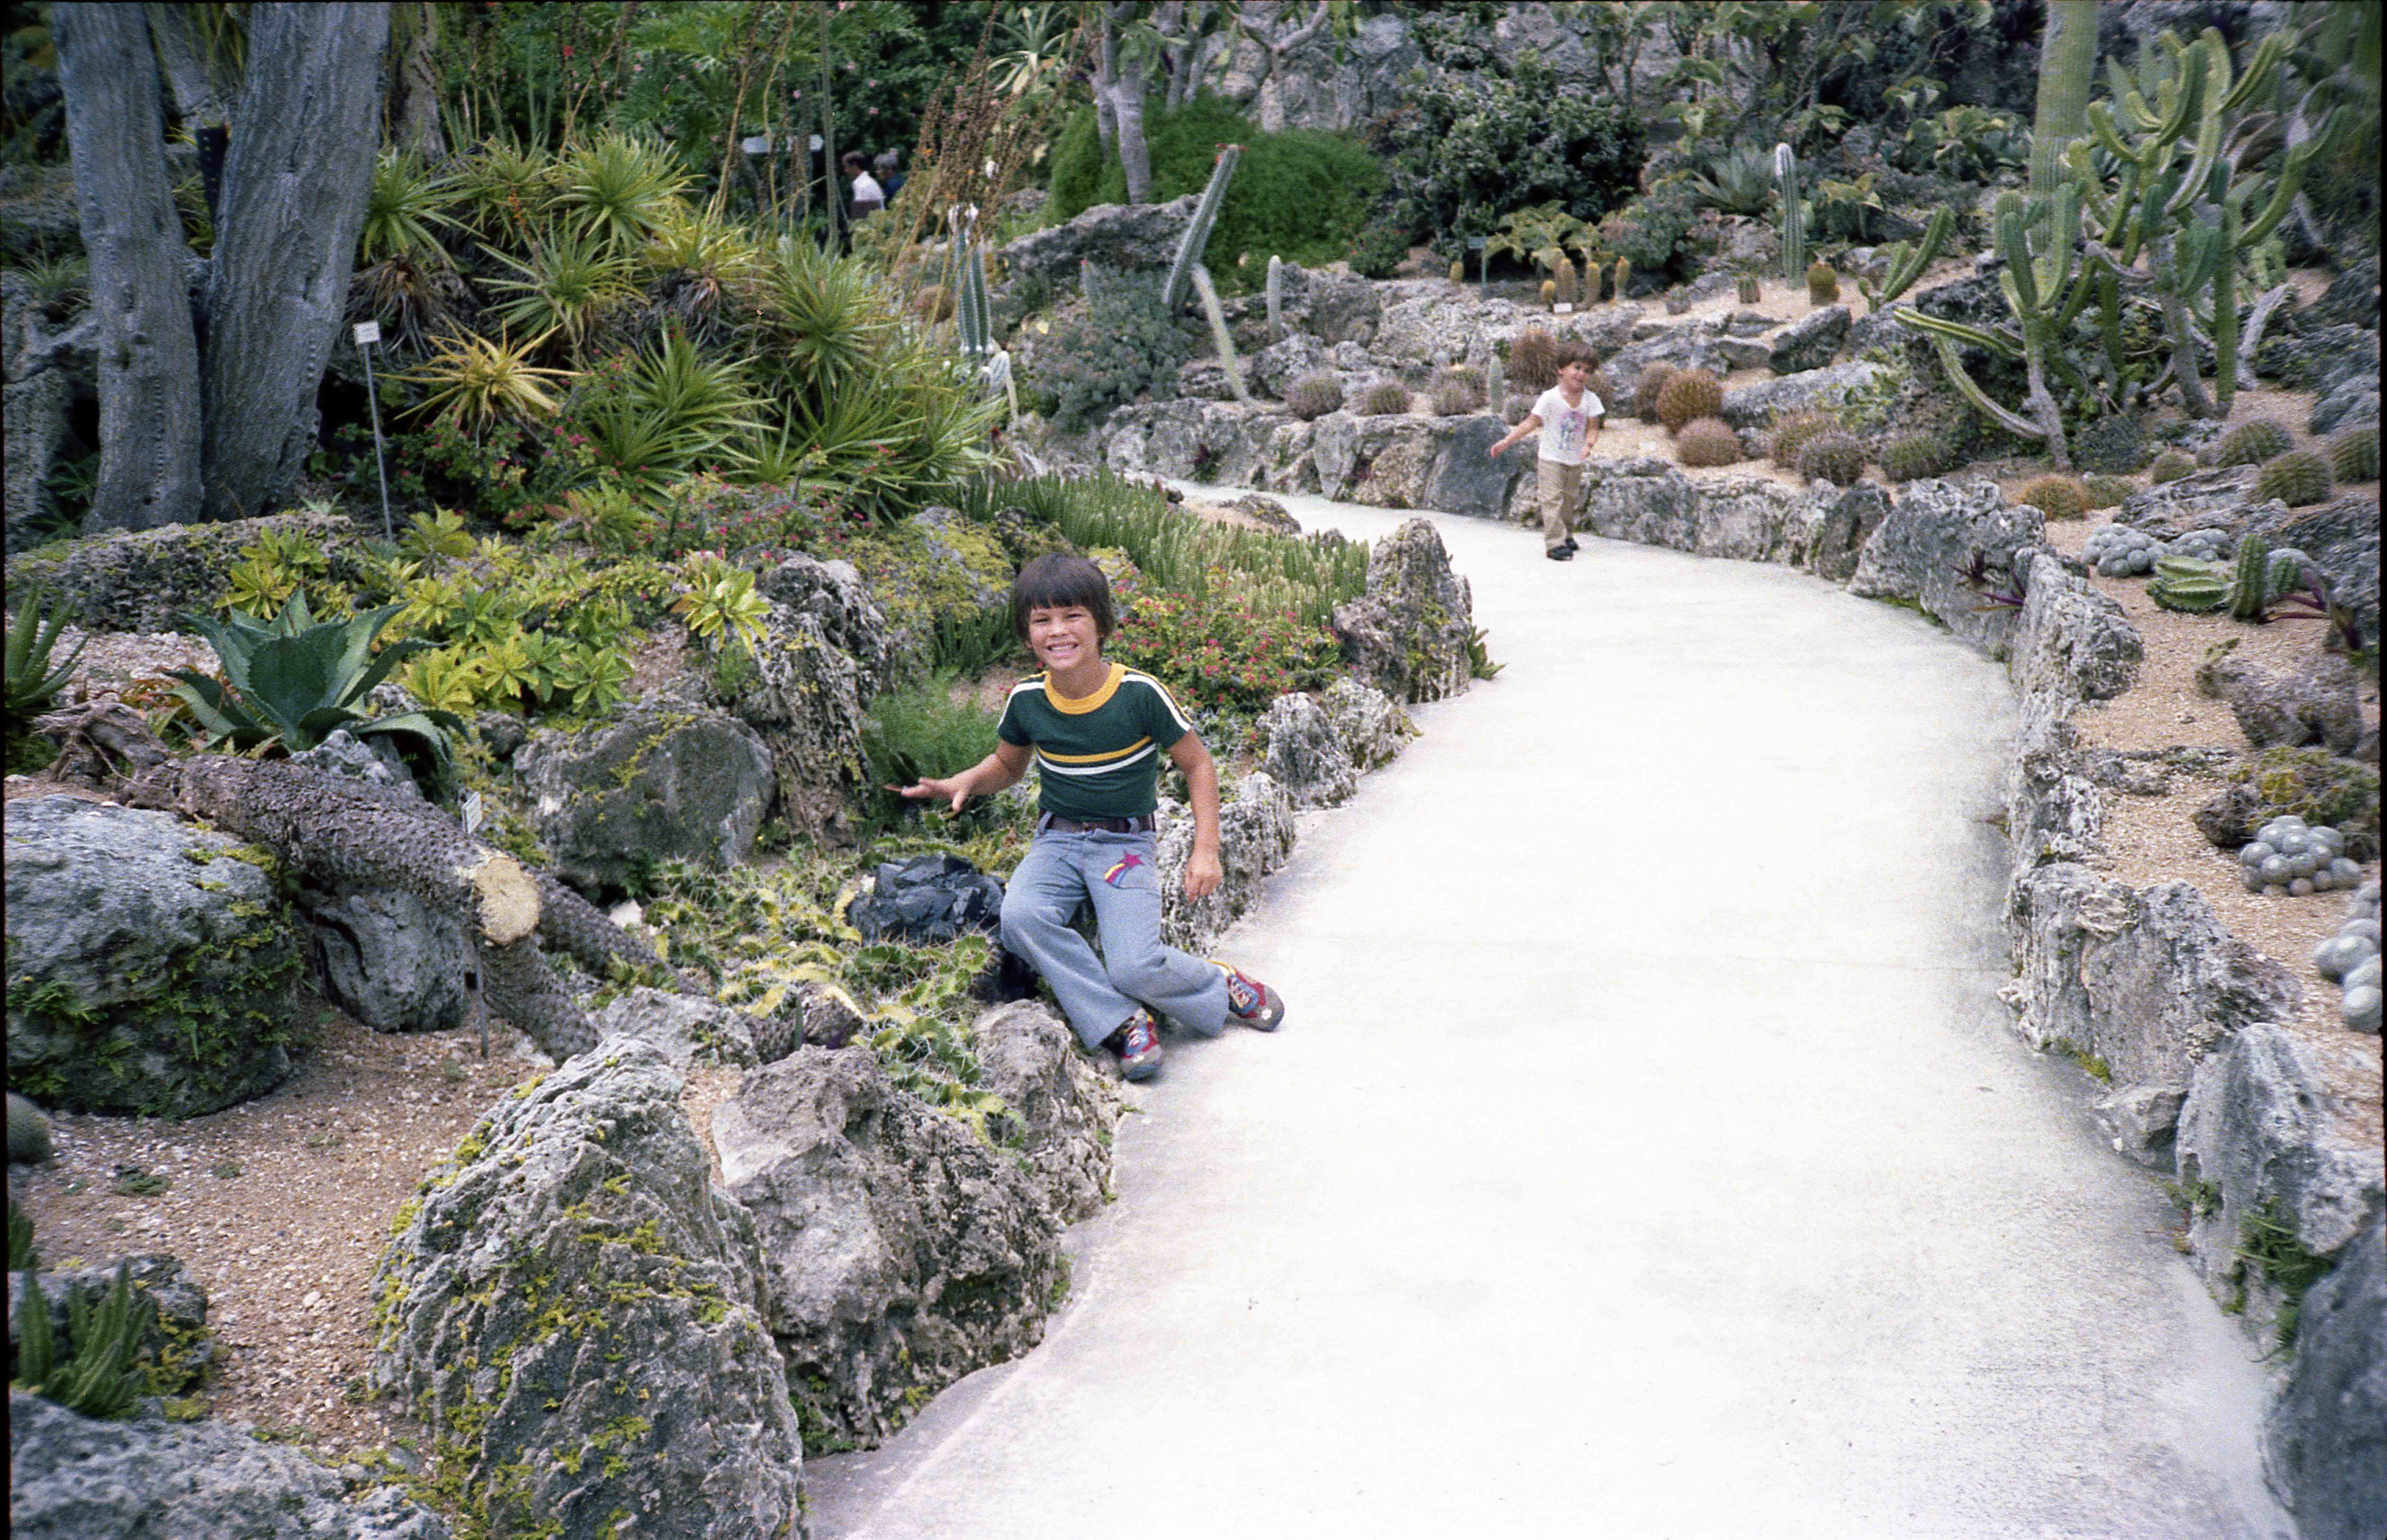 Chris Bobby on cactus garden pathwayjpg